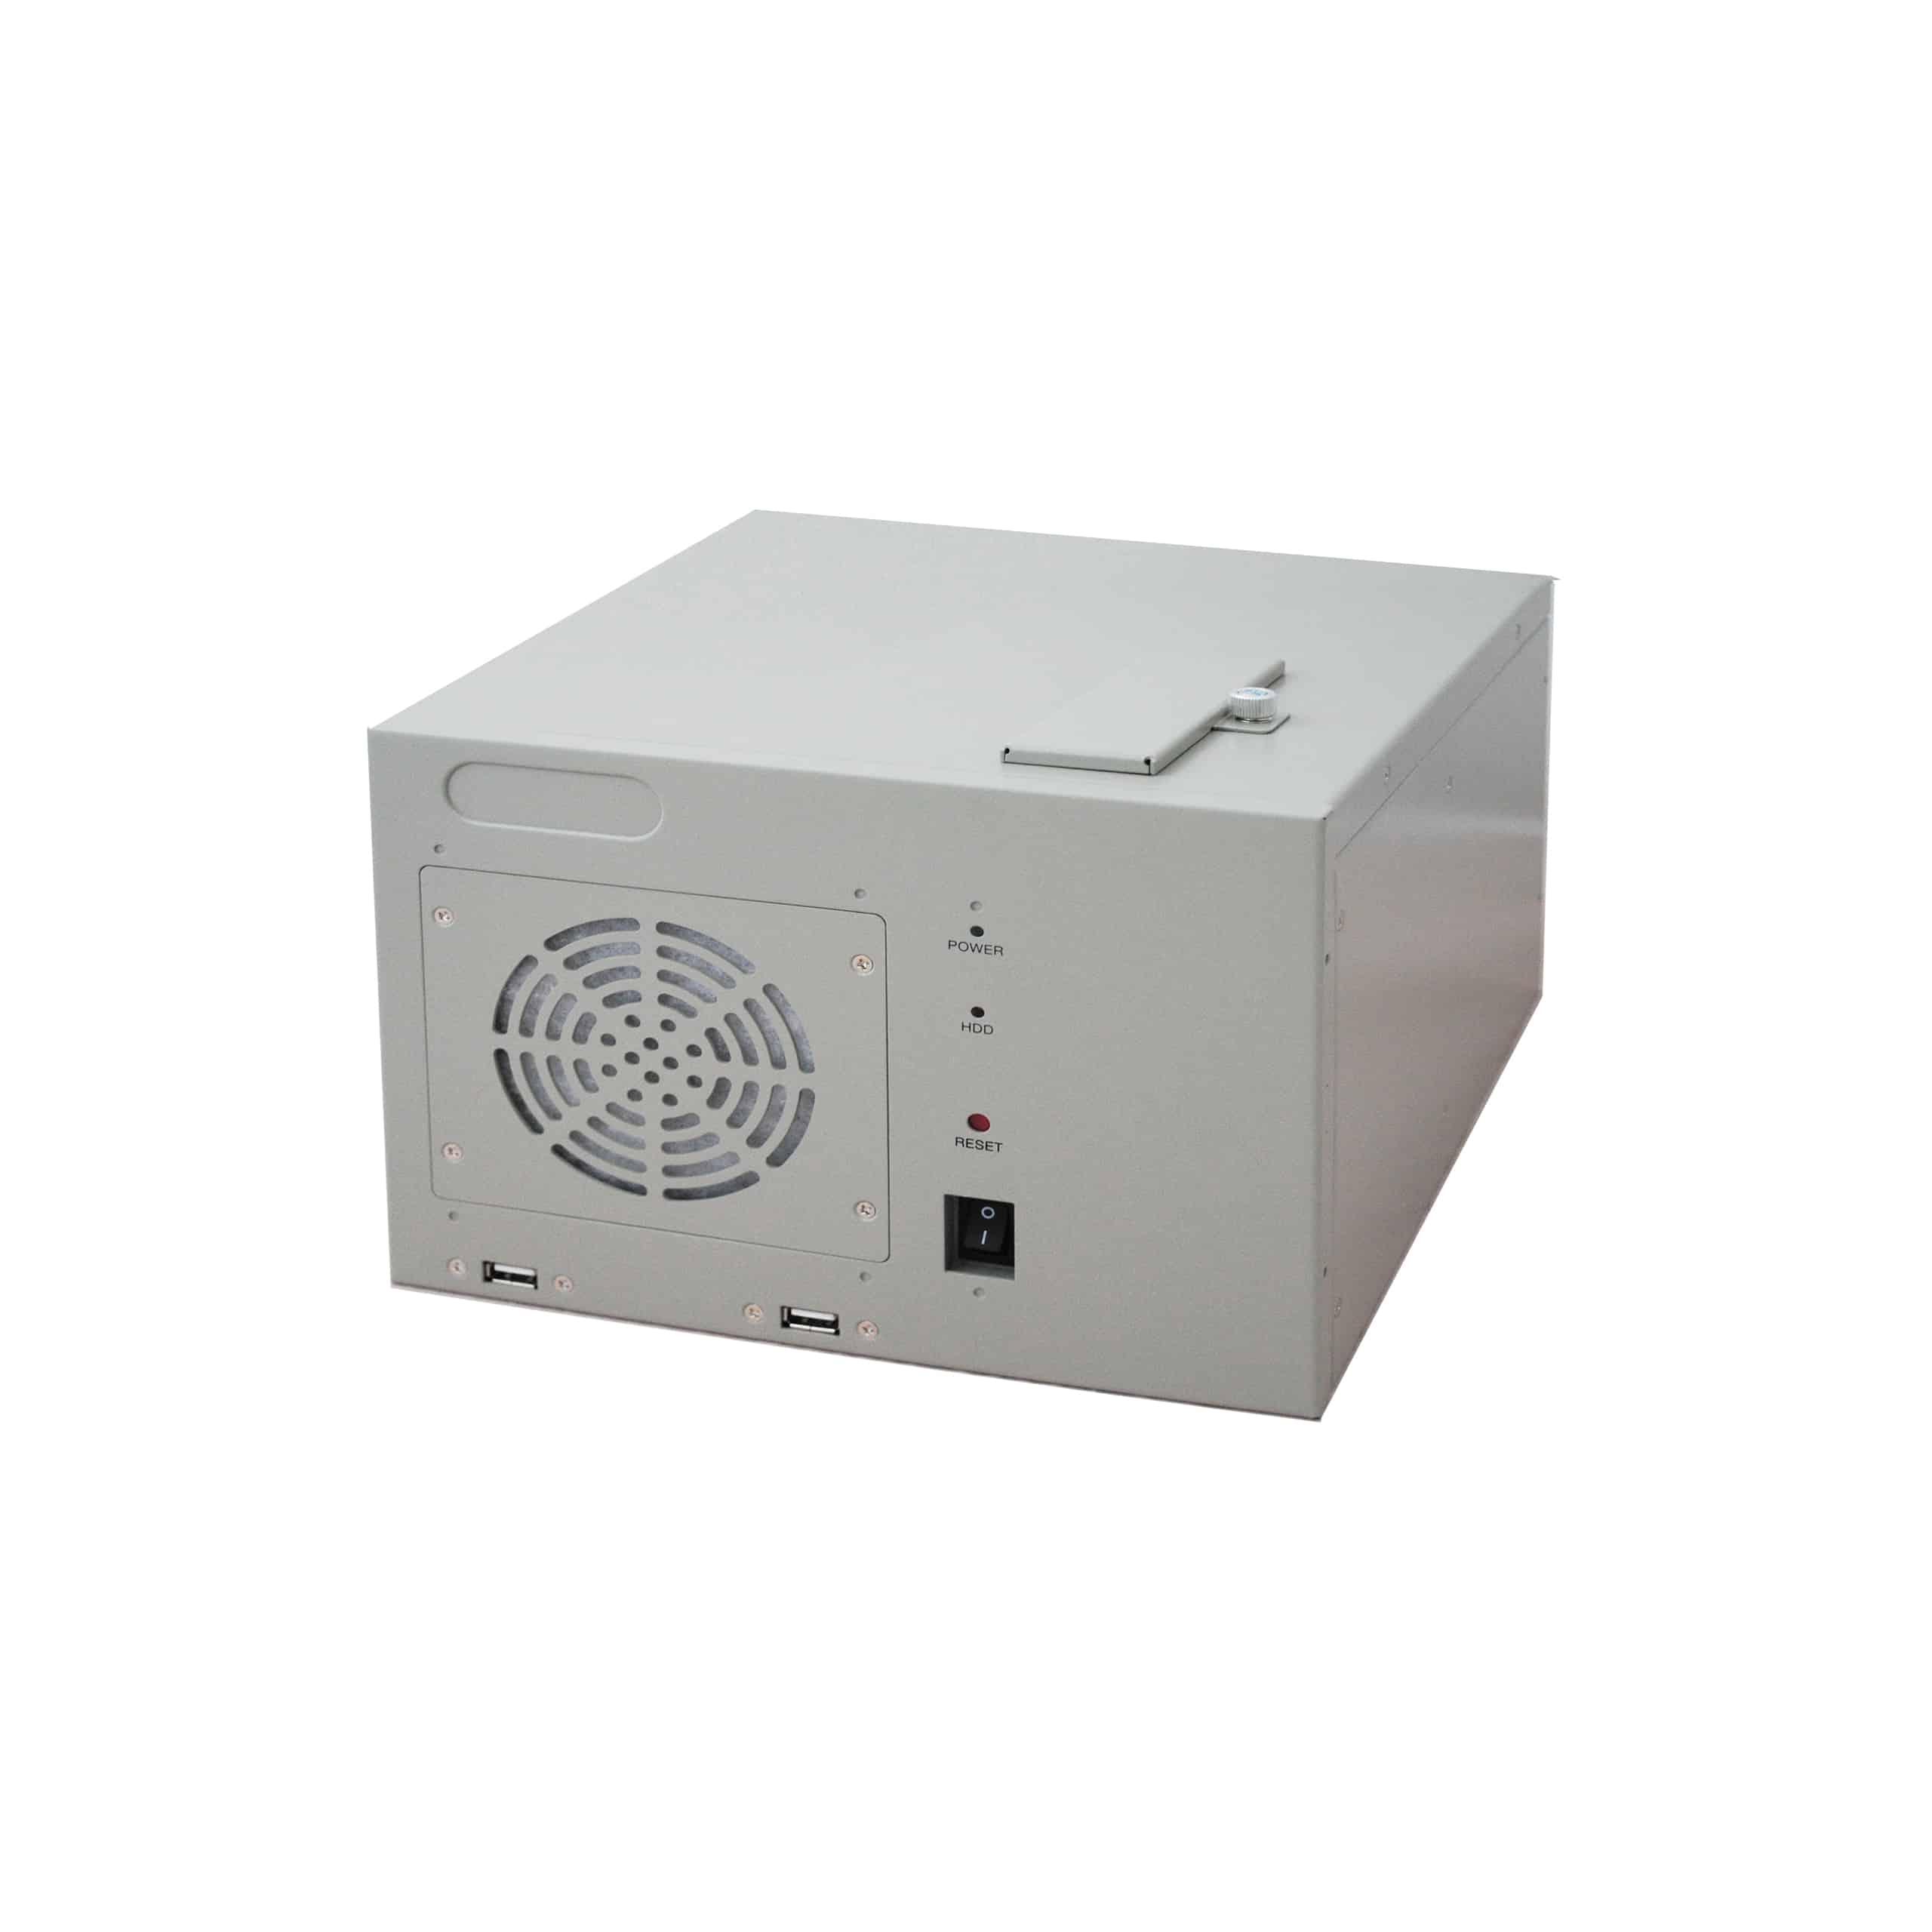 Iac Gmbh iac c860sa 870p wallmount chassis ipc intel pentiumm alptech